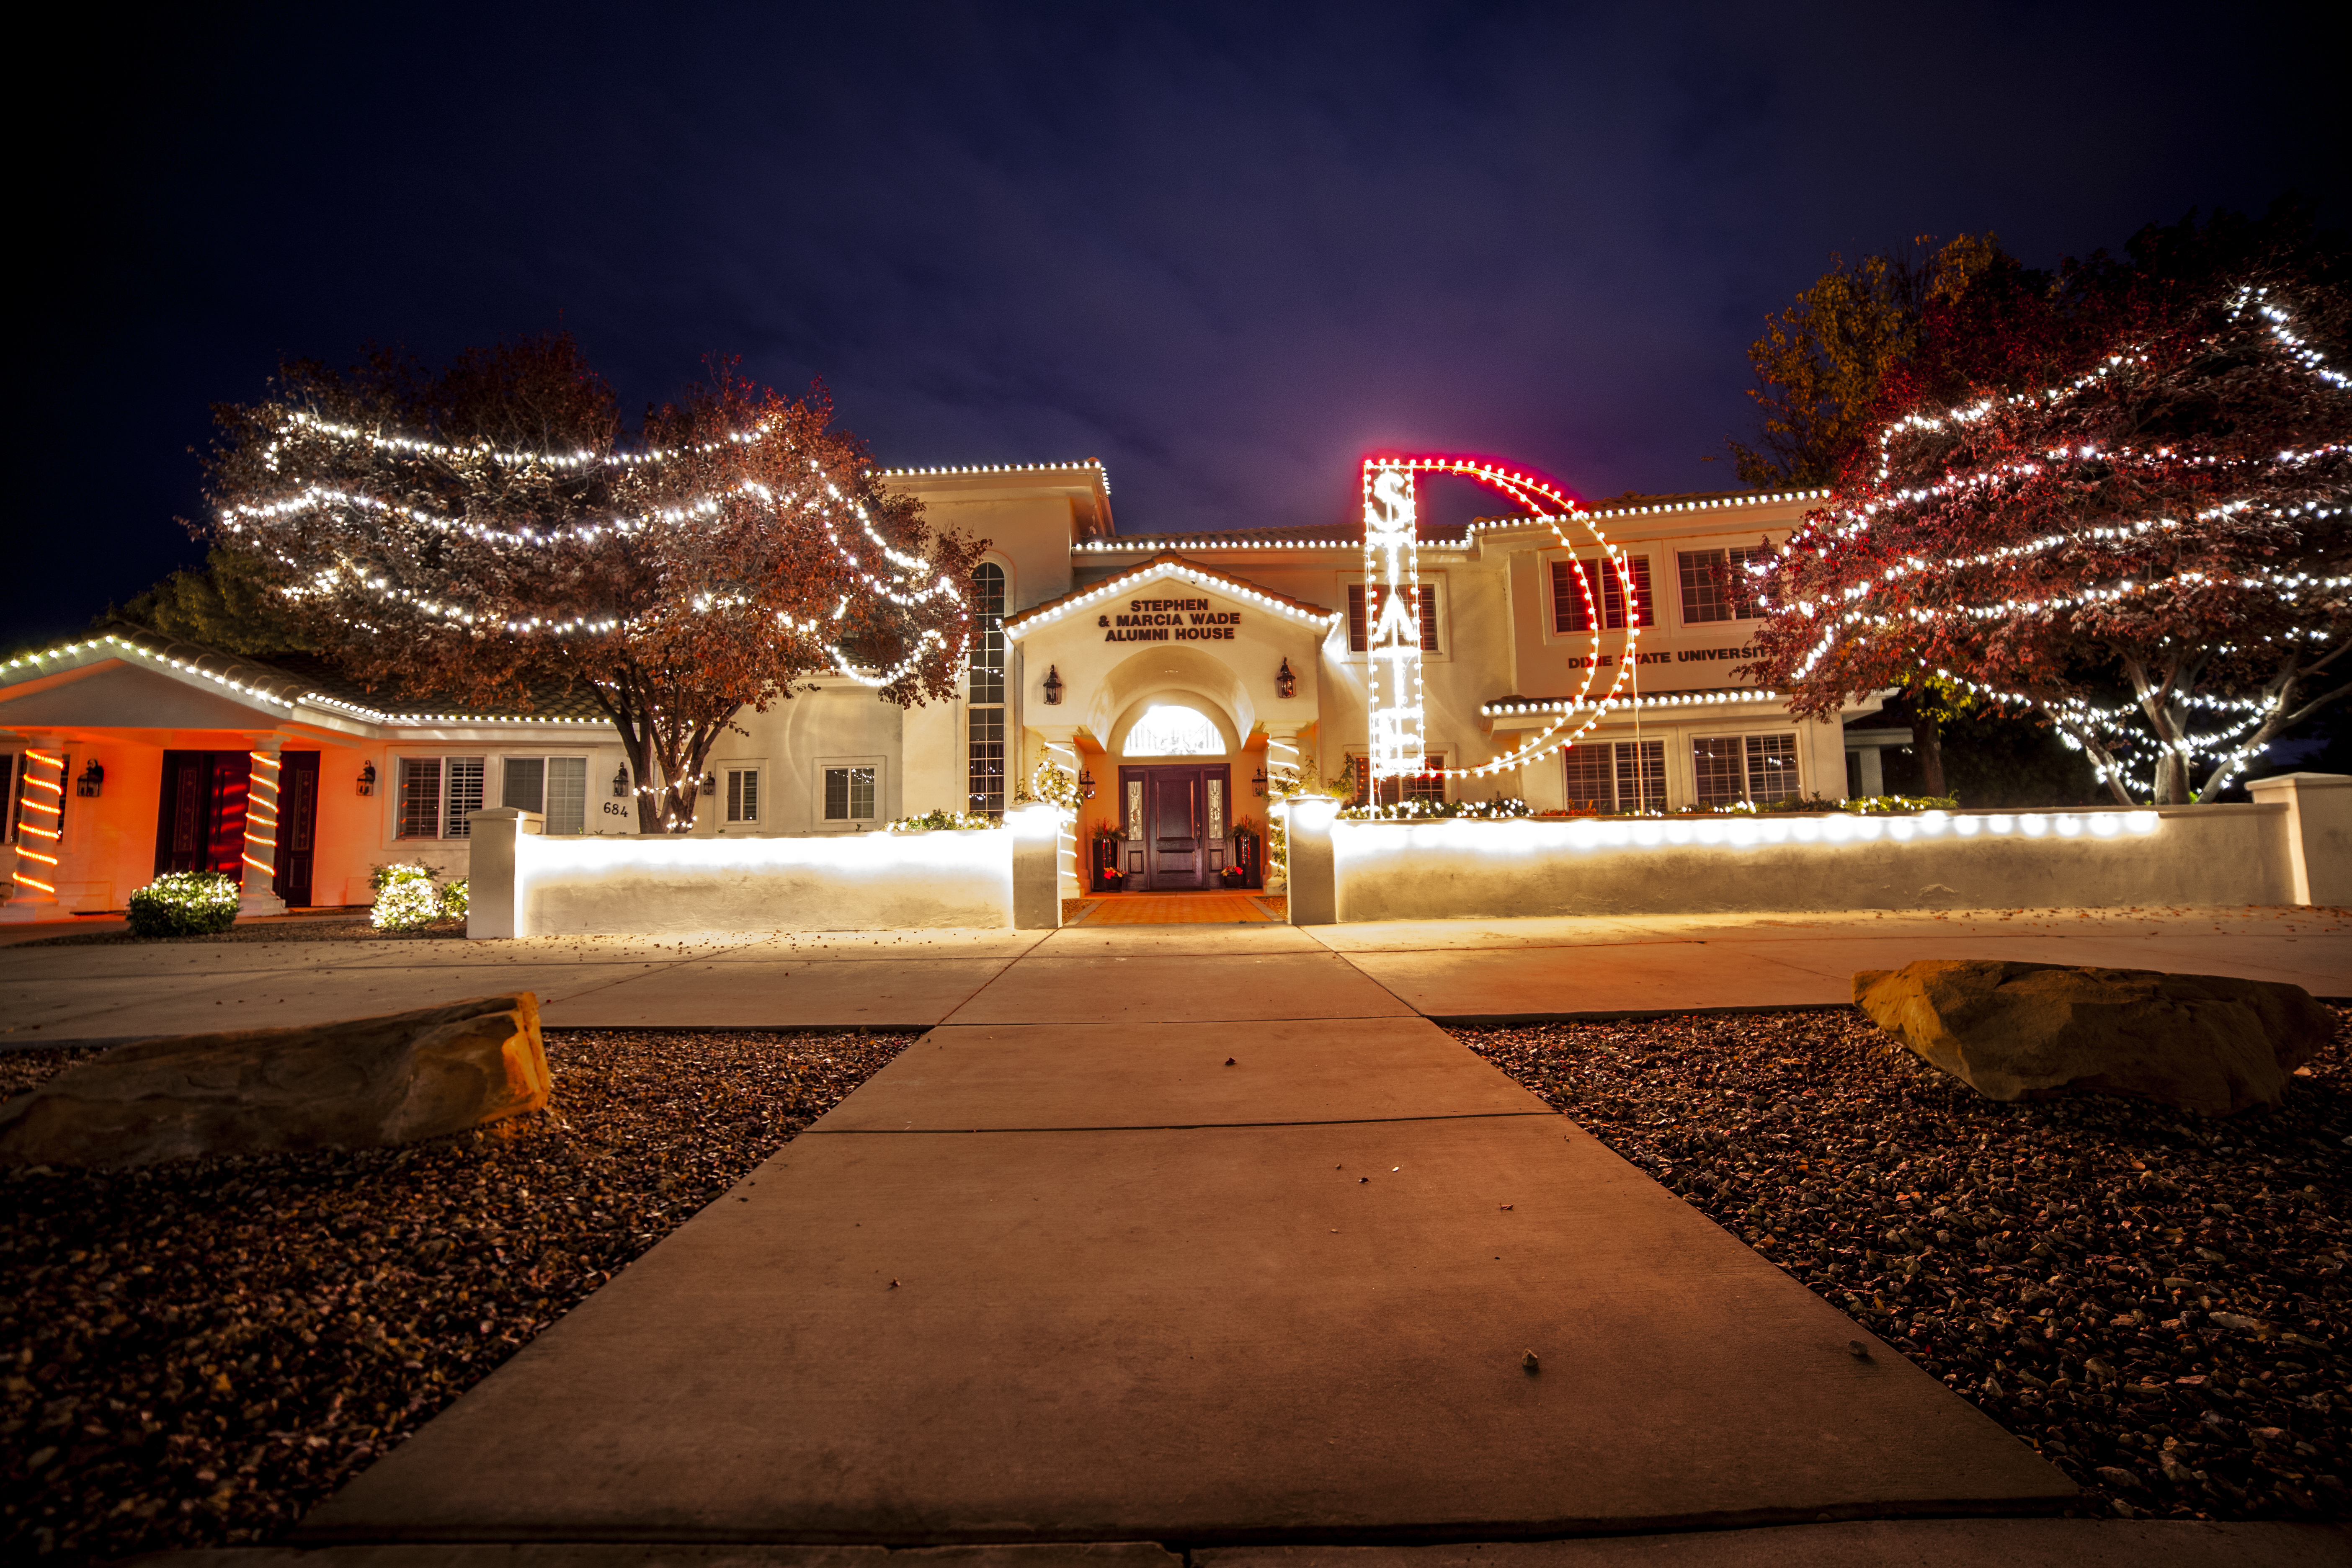 The Alumni House Event Center, Dixie State University, St. George, Utah, December 2014   Photo by Nate Truman courtesy of DSU Student Alumni Association President Chet Norman, St. George News